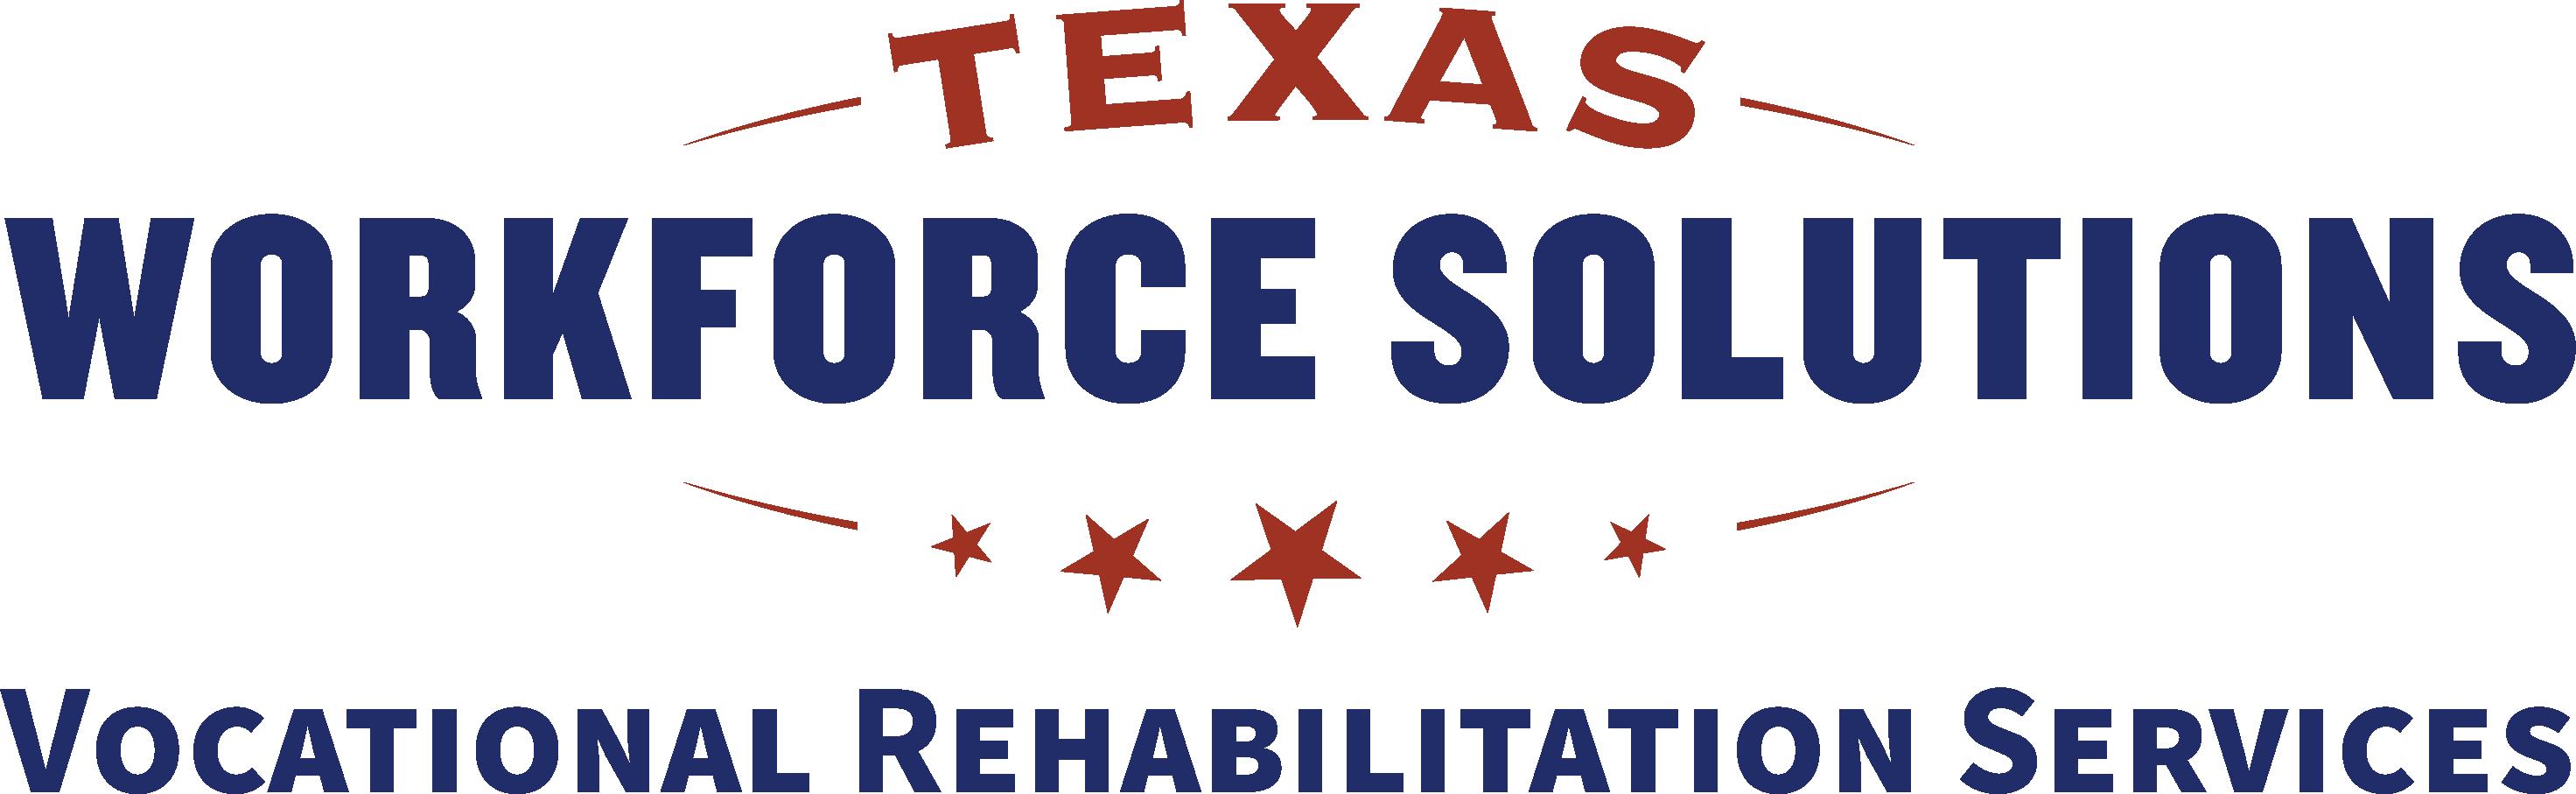 Texas Workforce Solutions Logo